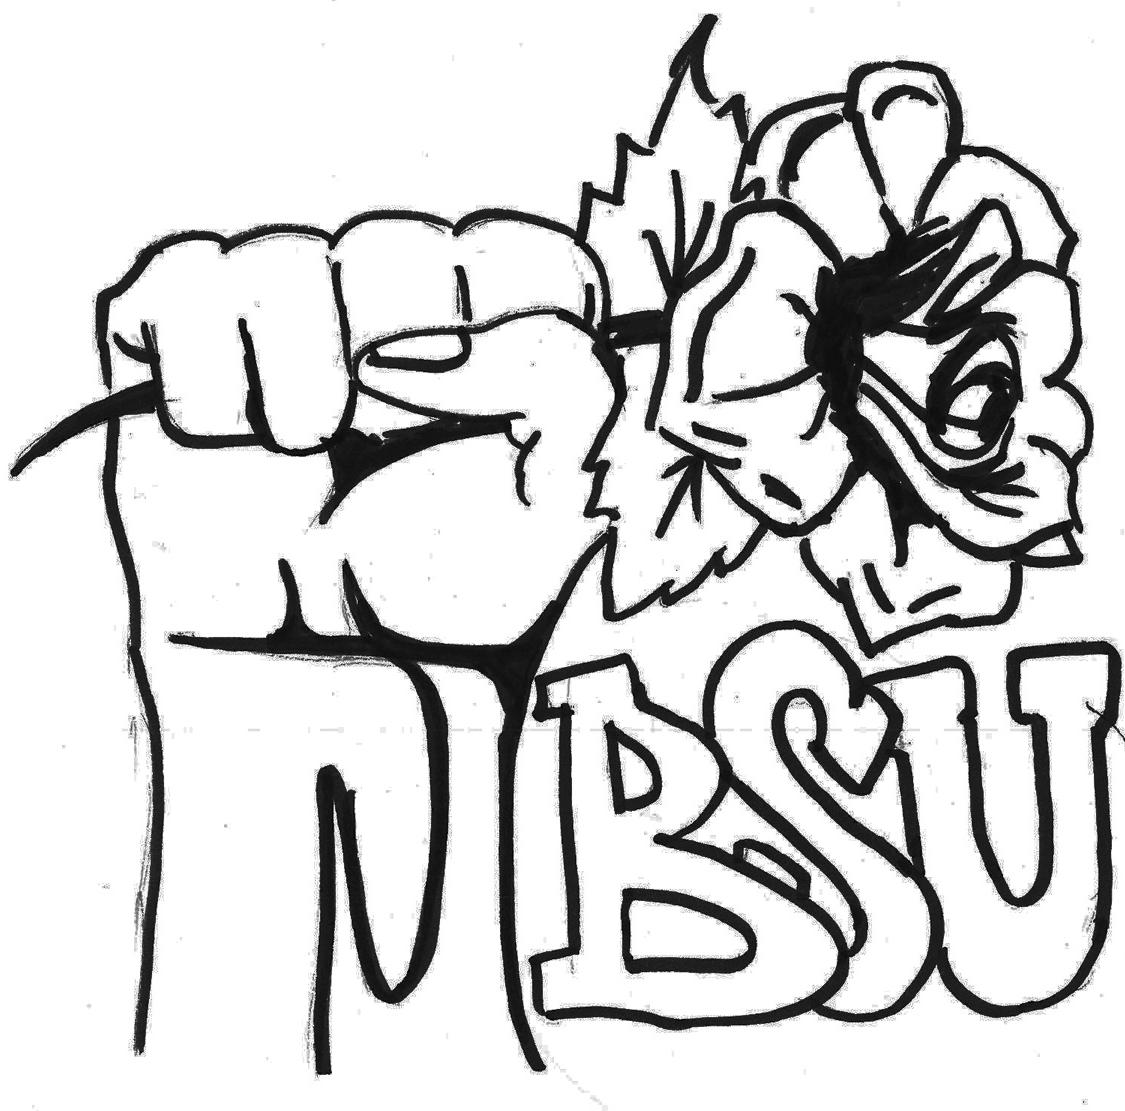 Student design from Beaverton High School's Black Student Union